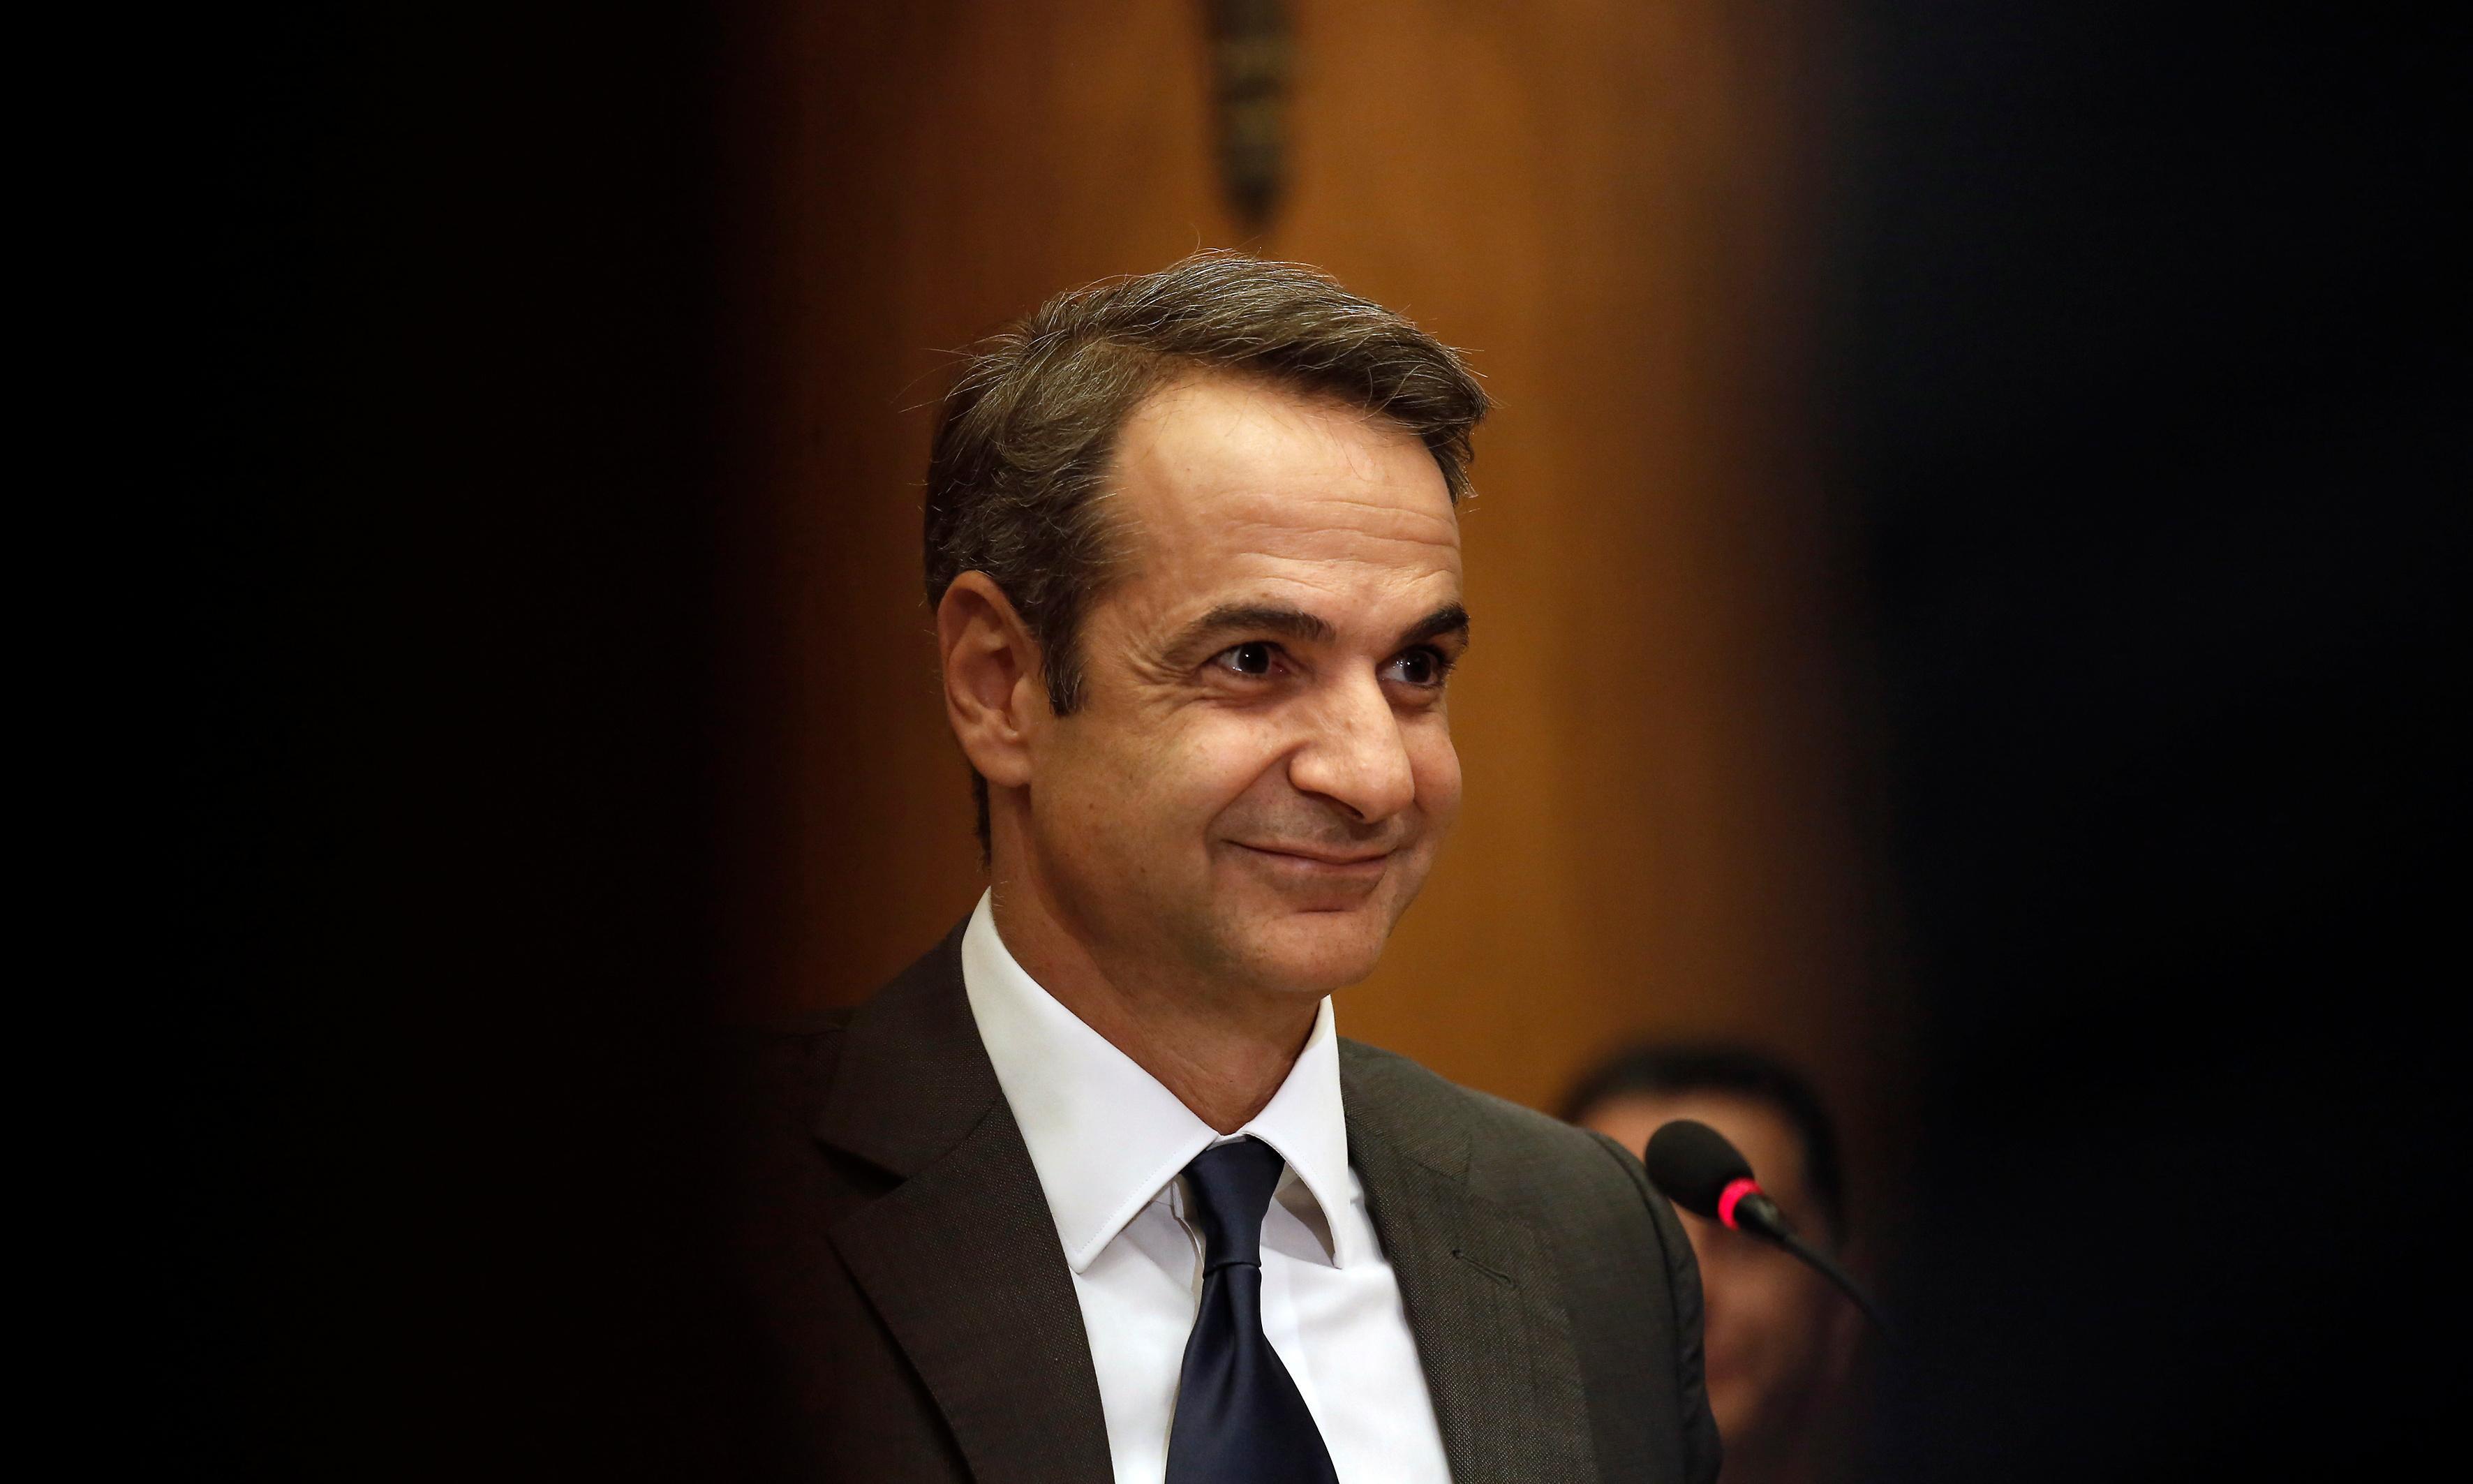 Kyriakos Mitsotakis: the new Greek PM hits the ground running